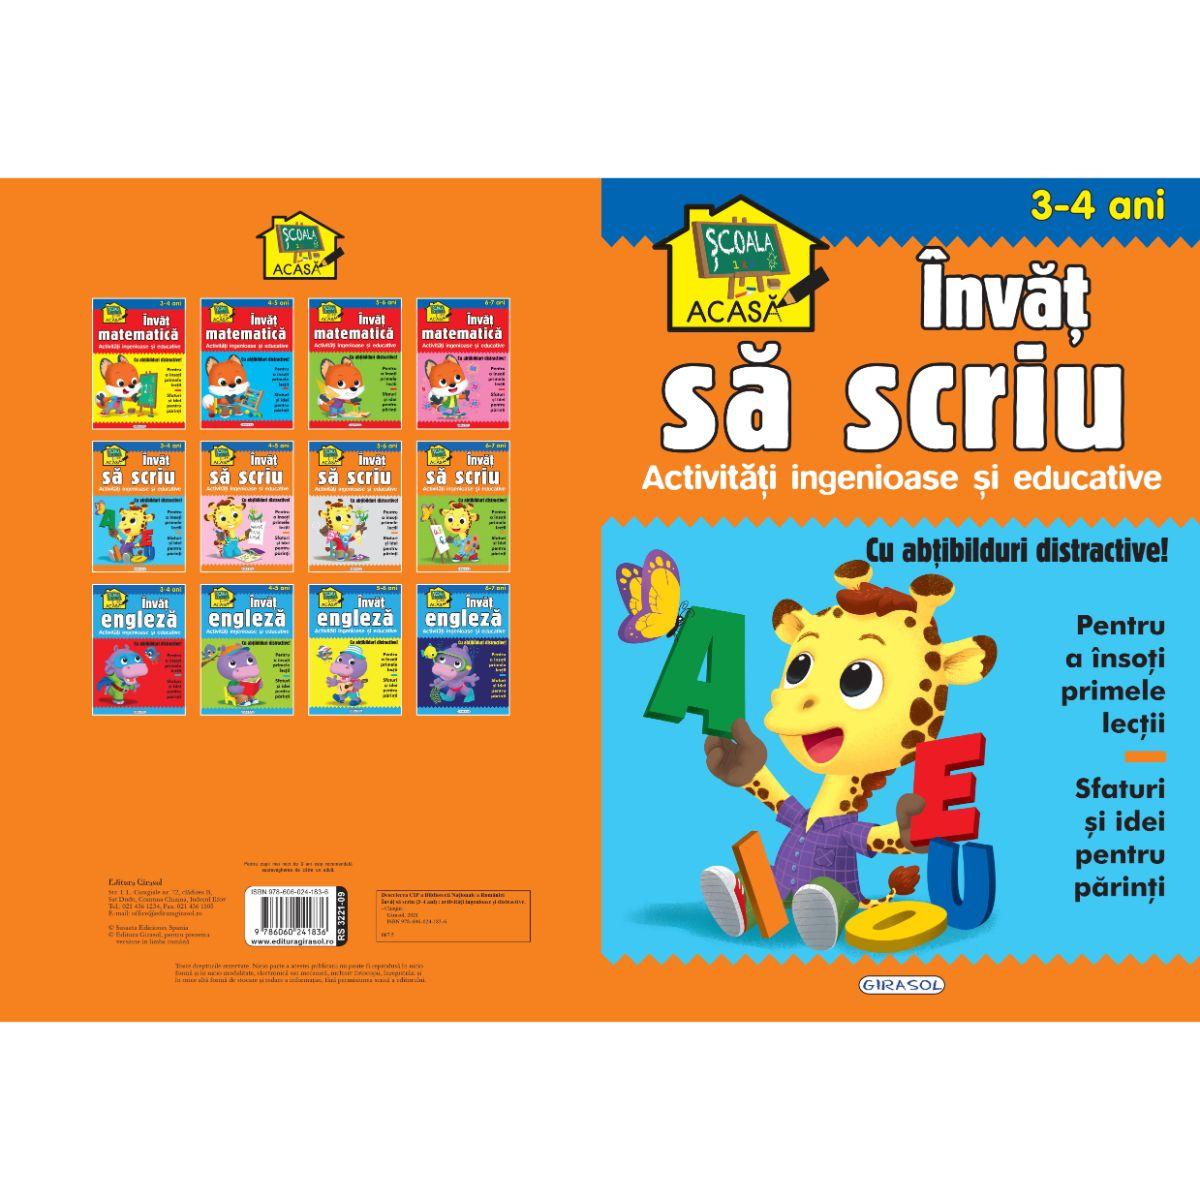 Scoala acasa, Invat sa scriu, 3-4 ani